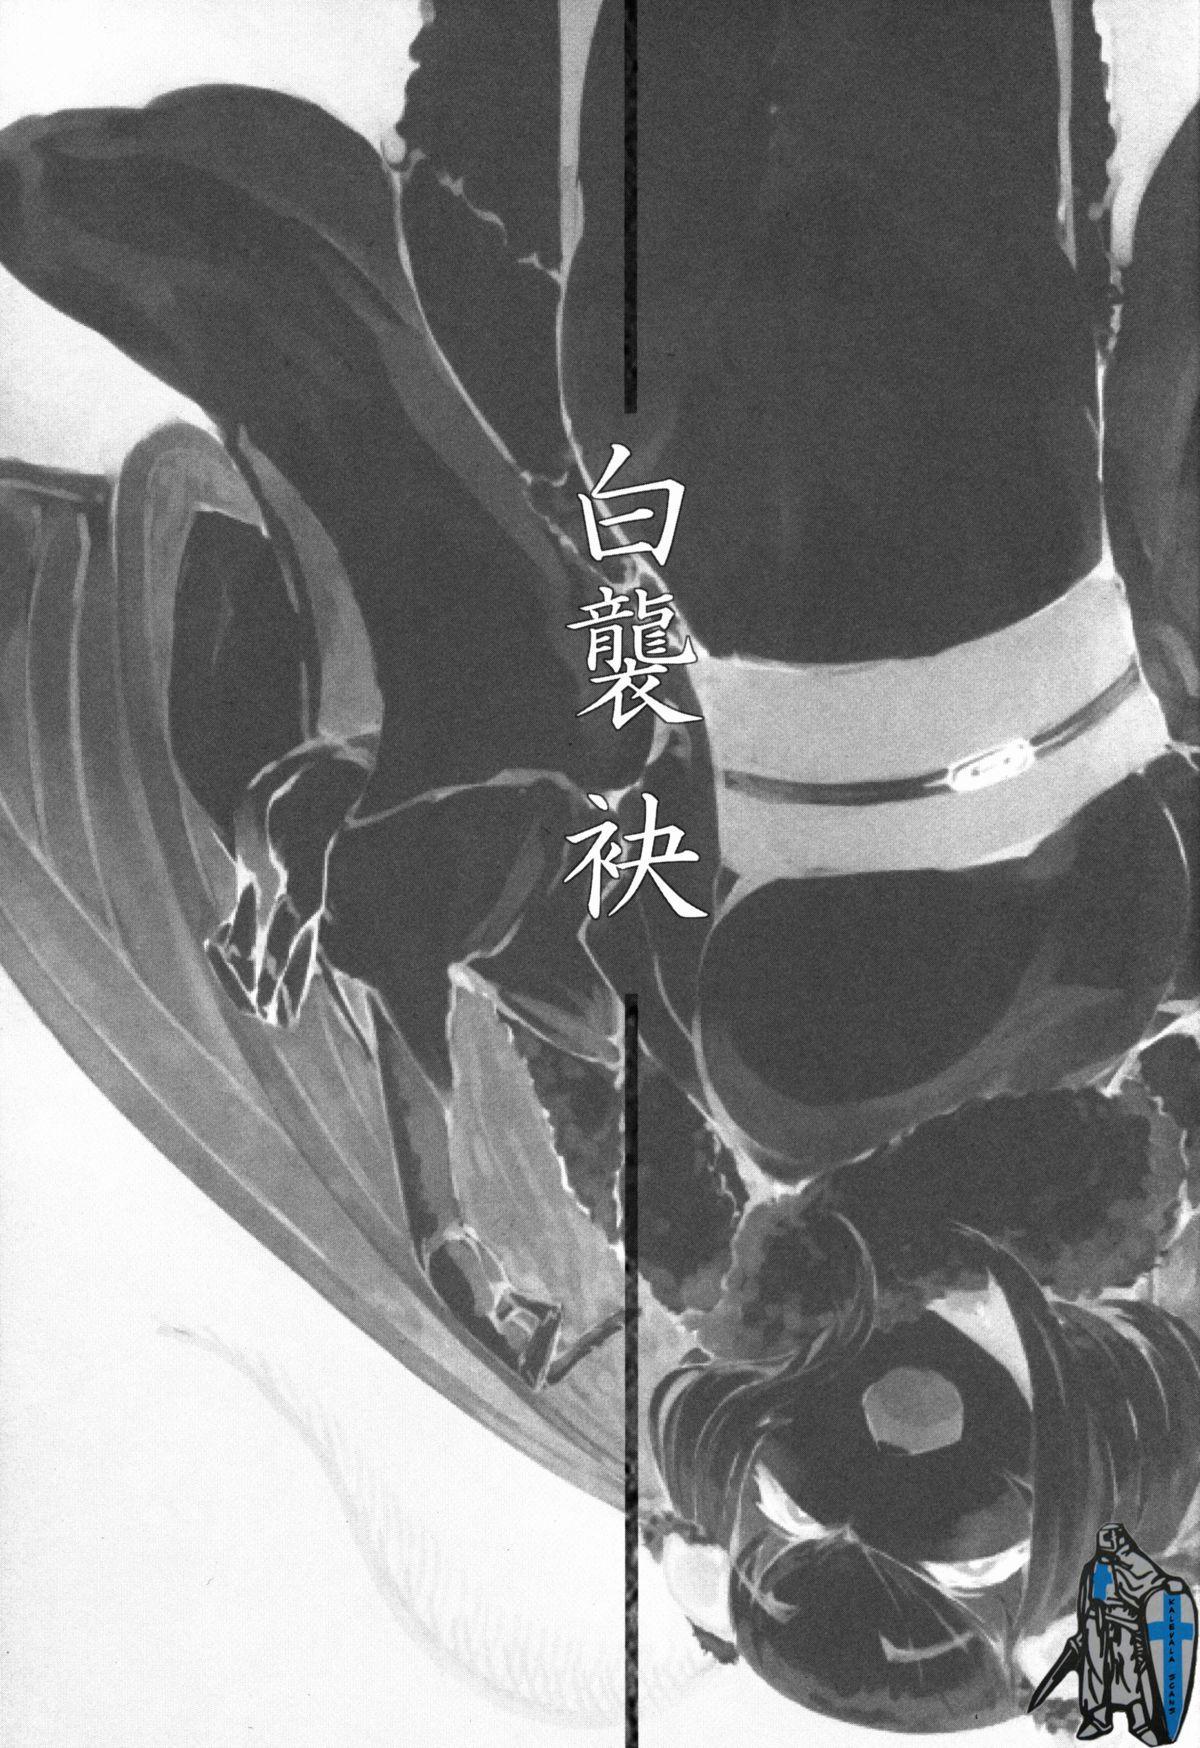 (COMIC1☆9) [Sakekan Memorial (SOLOPIPB)] Shiragasane -Tamoto-   Layers of White 2 [English] [rampantserenity] 1